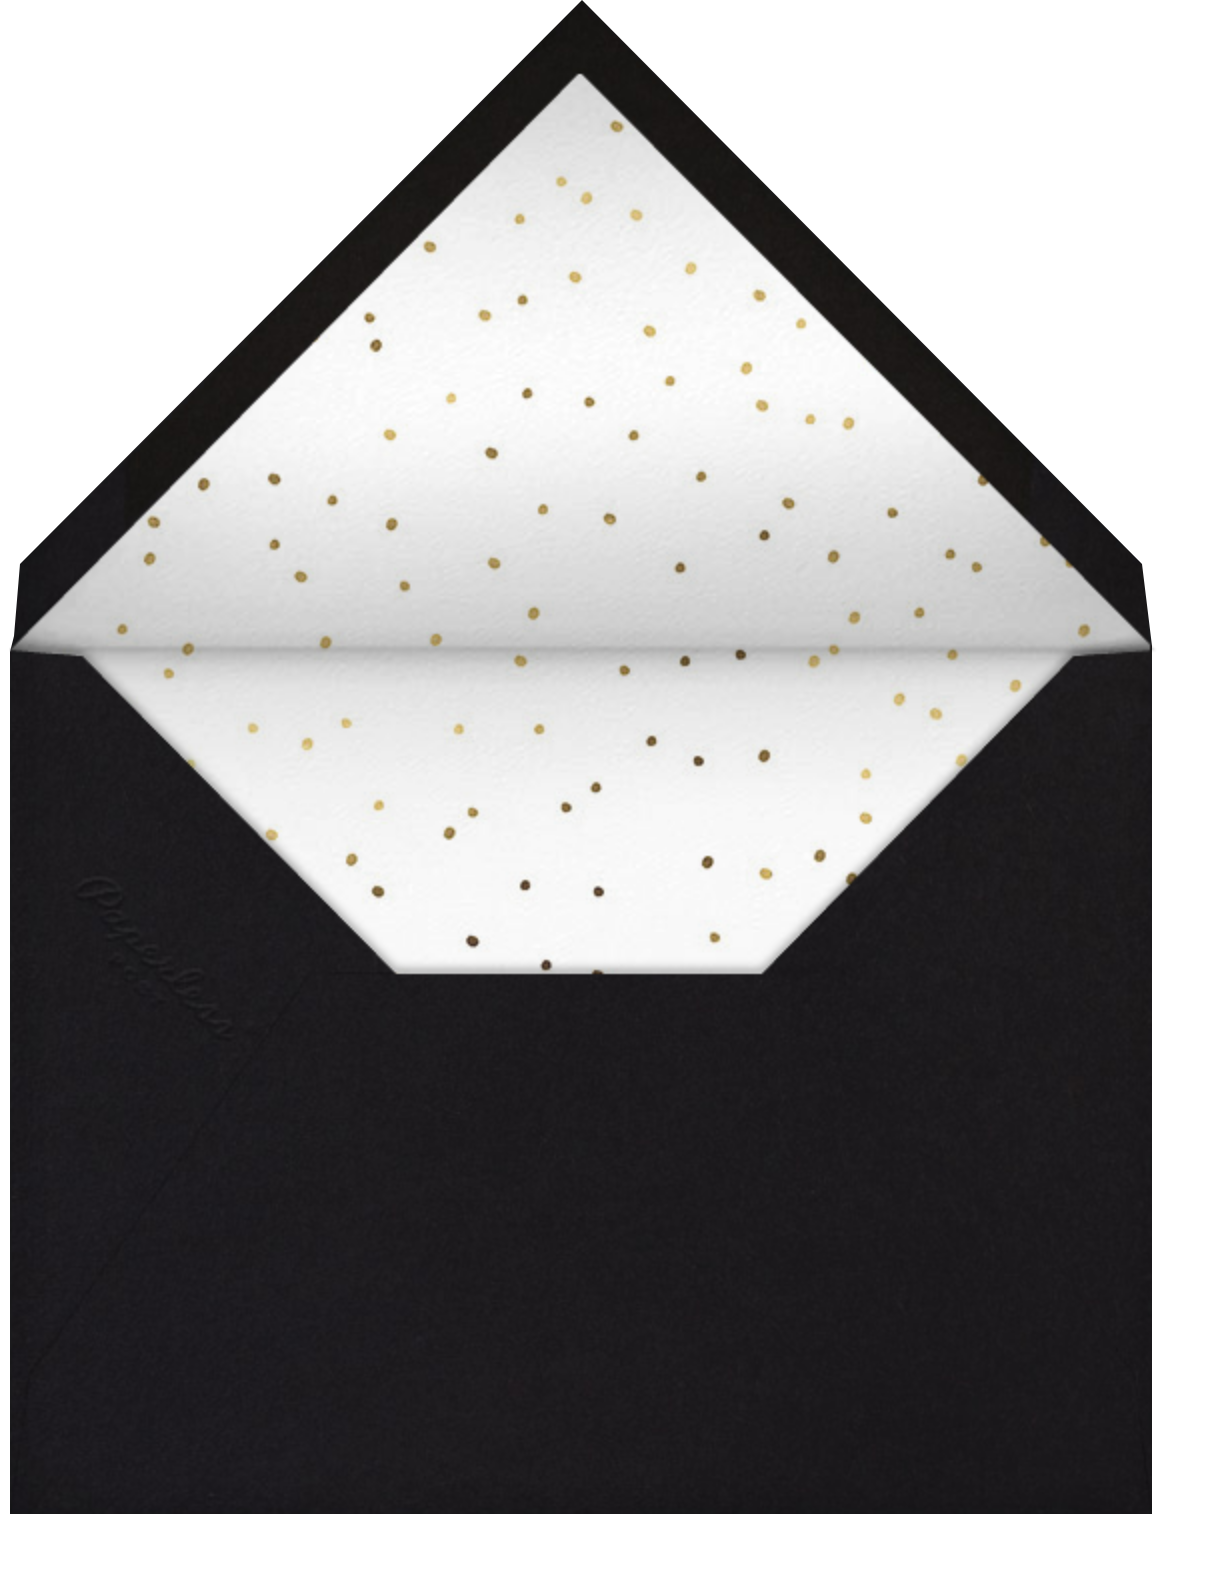 Uncorked - Mr. Boddington's Studio - Professional events - envelope back